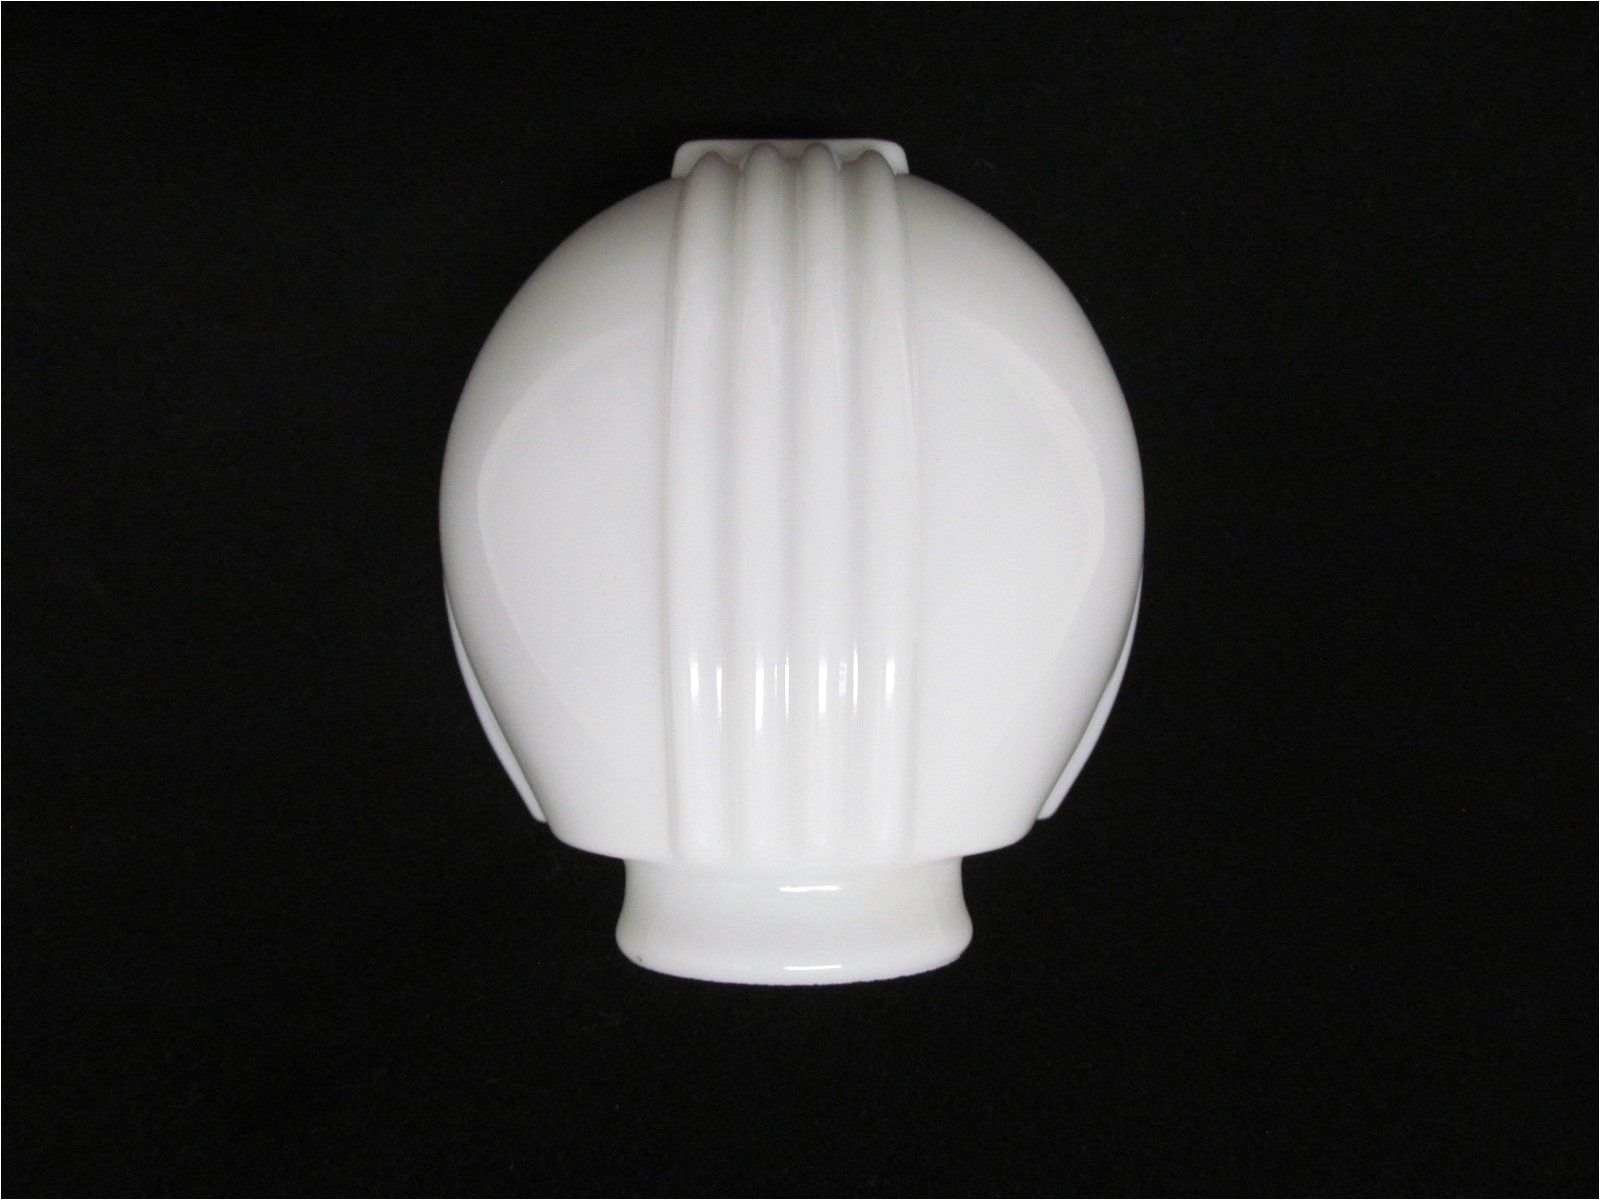 vintage art deco style milk glass light cover vintage glass lamp shade vintage lighting